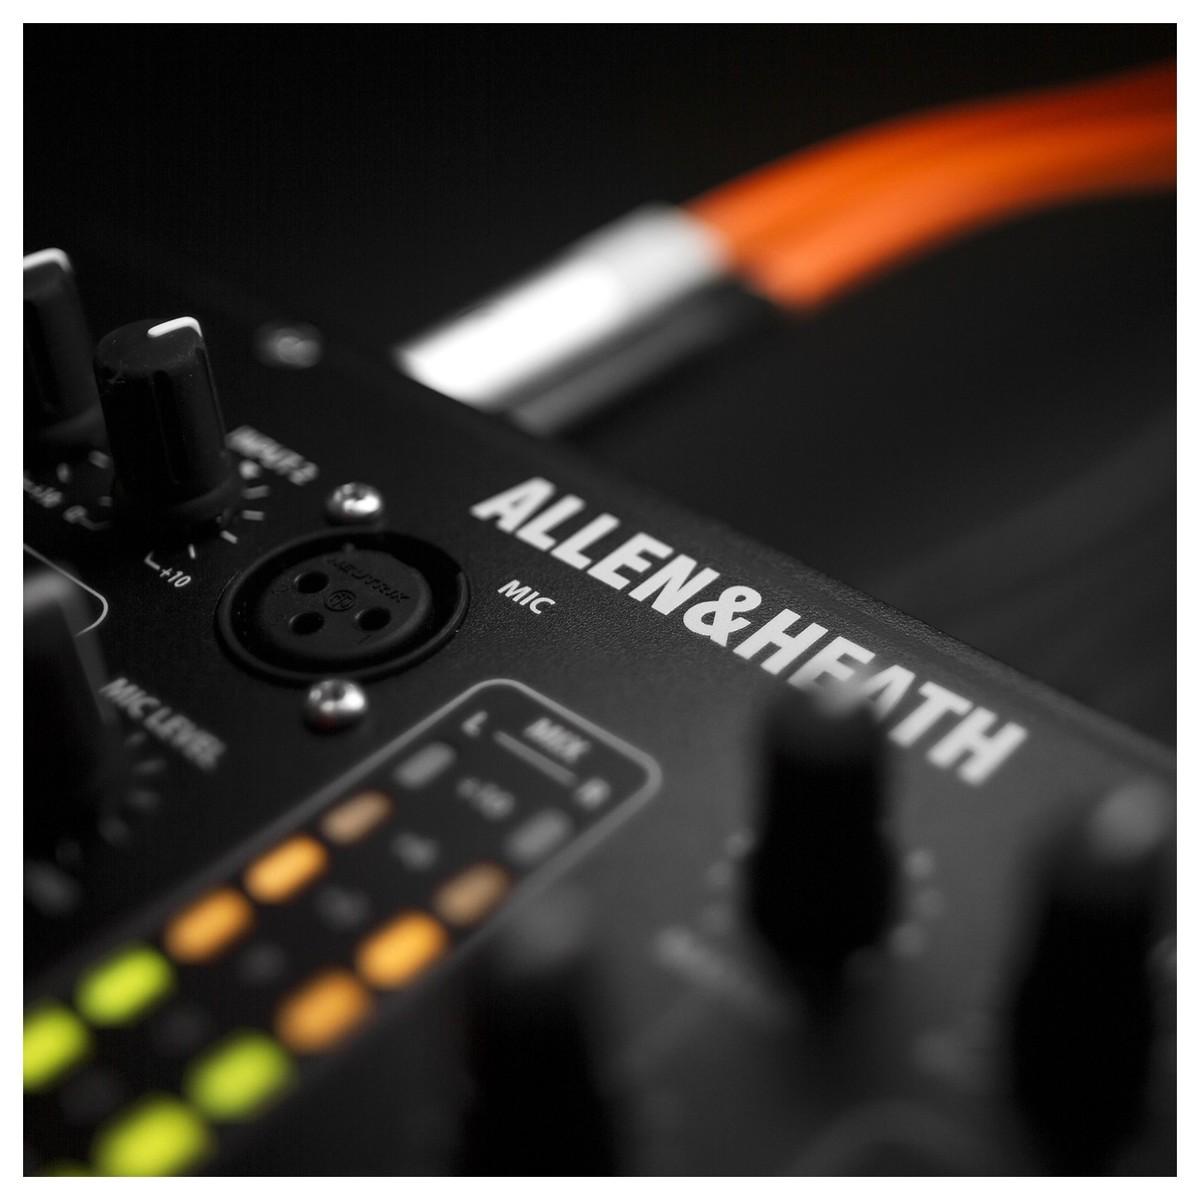 allen and heath xone 23 dj mixer gear4music. Black Bedroom Furniture Sets. Home Design Ideas